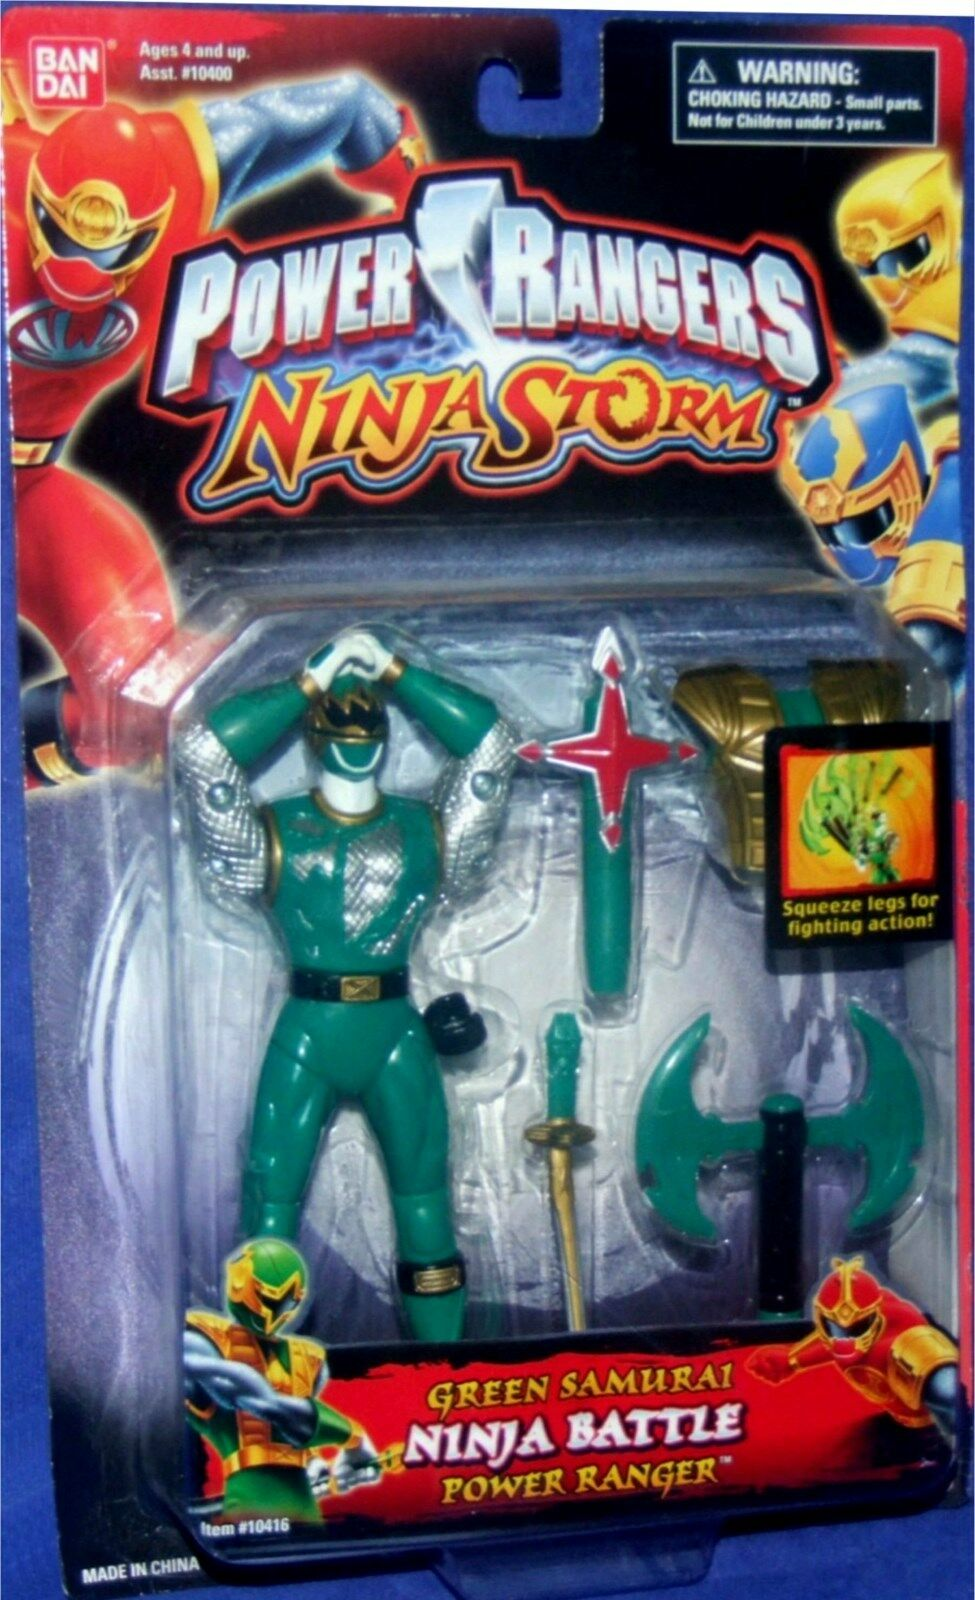 energia Rangers Ninja Storm 5 verde Samurai Ninja battaglia Ranger nuovo Factory Seal